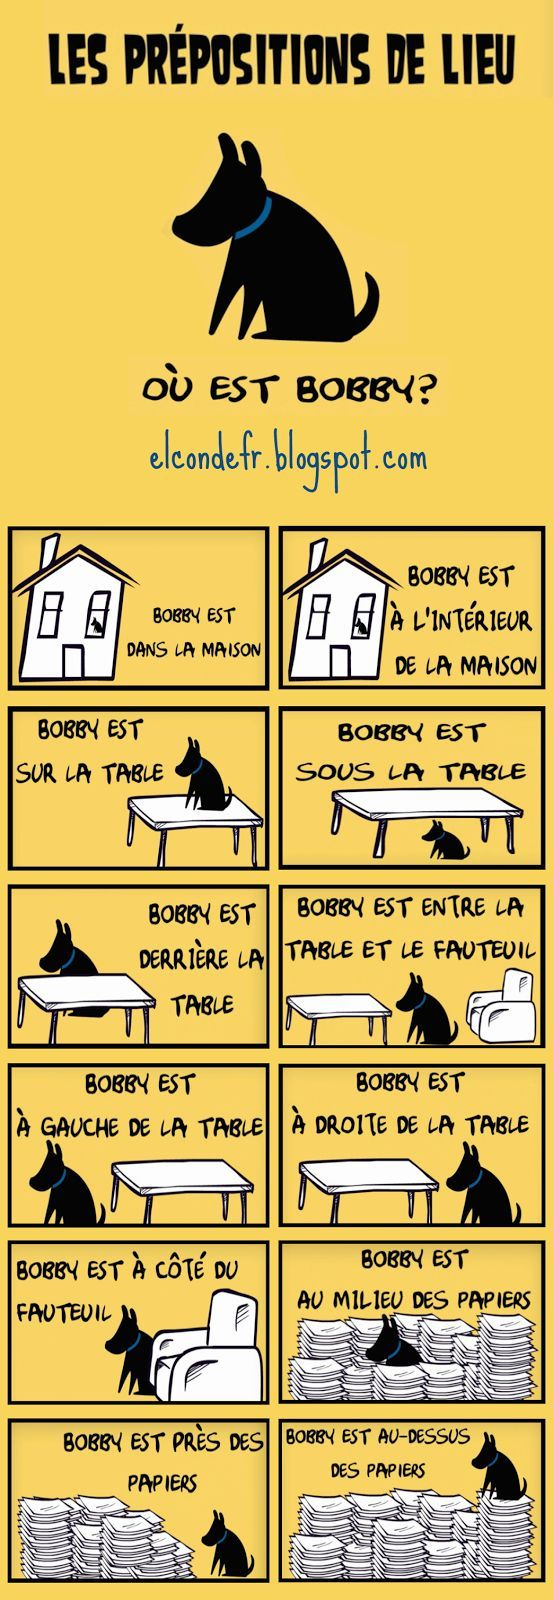 French Grammar: les prépositions de lieu Más: